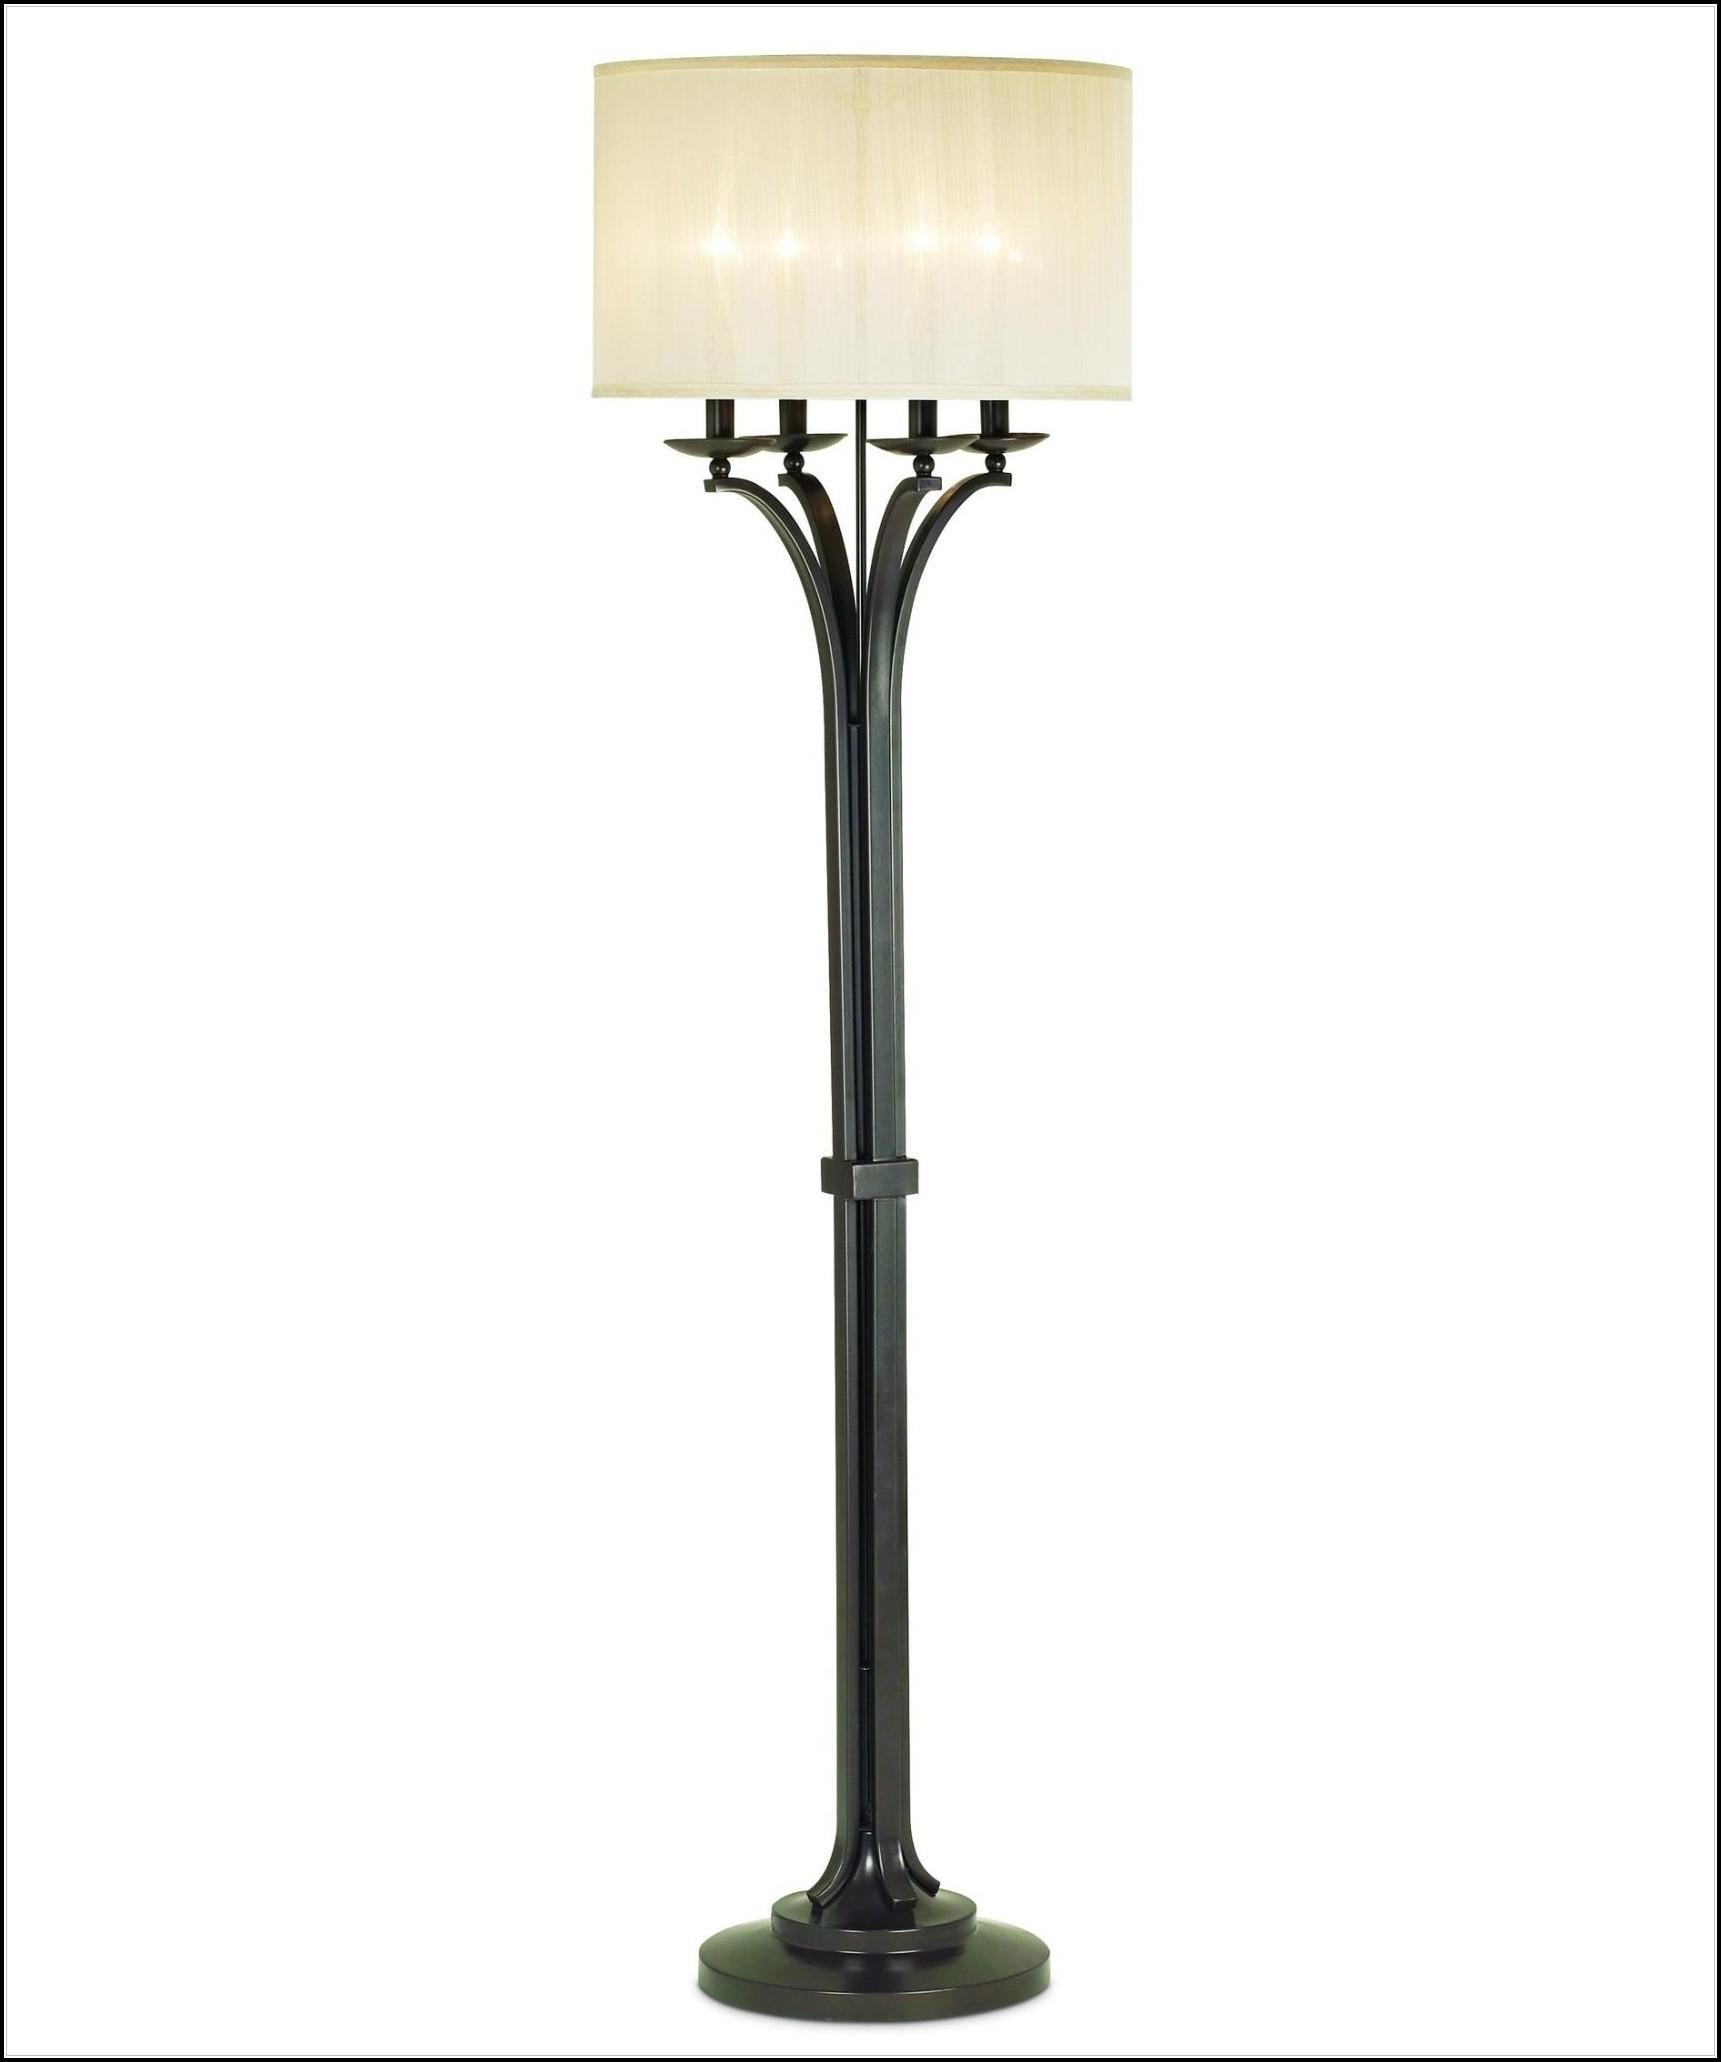 Kathy Ireland Floor Lamps